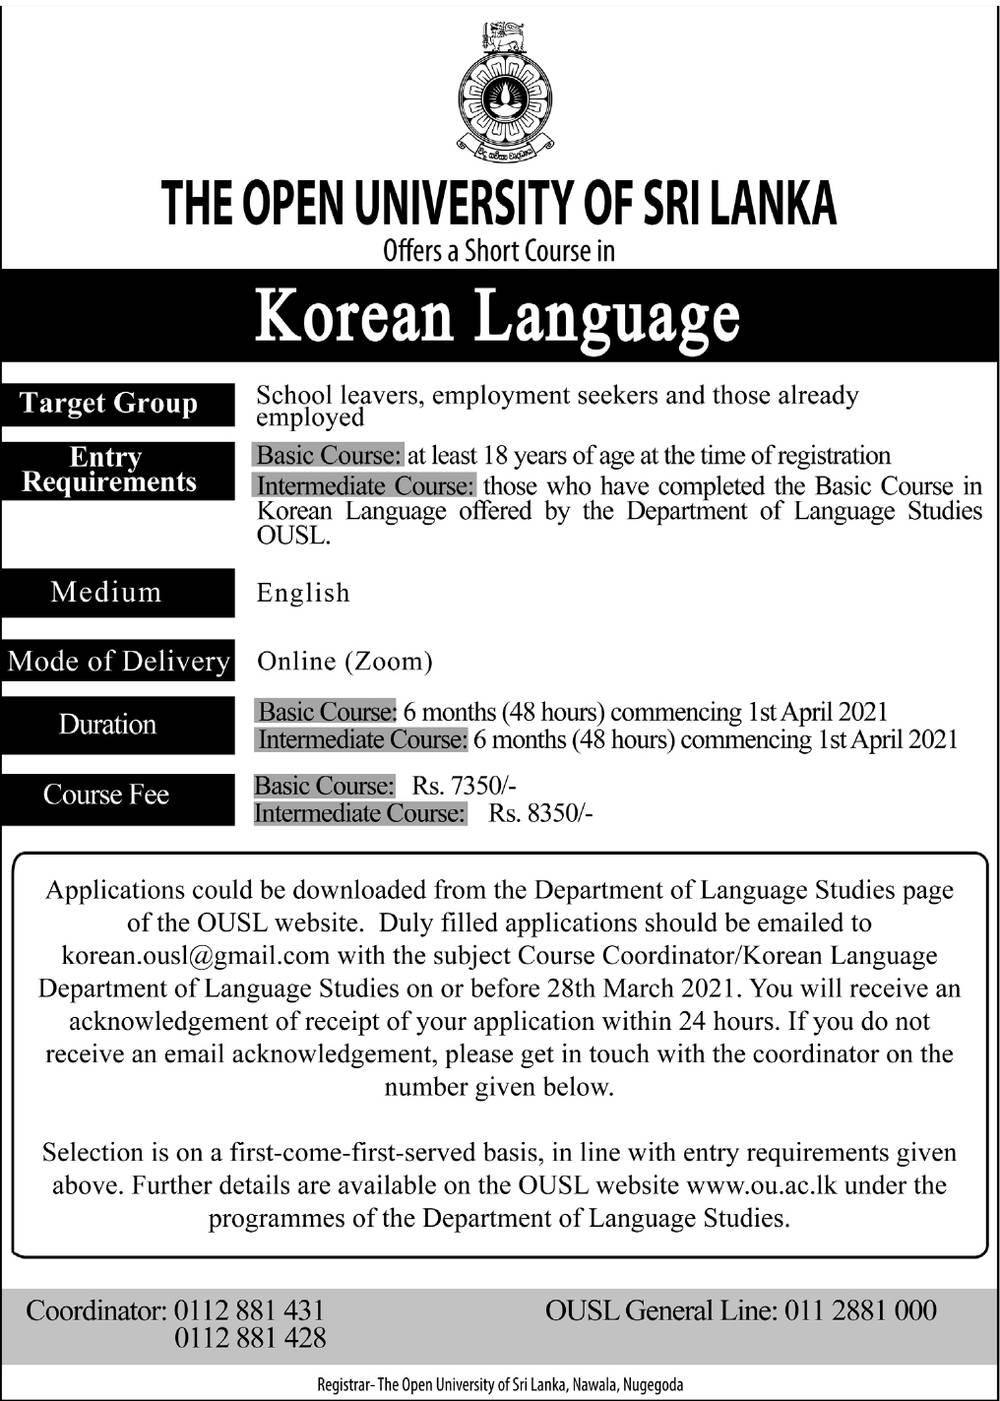 Short Course in Korean Language - The Open University of Sri Lanka